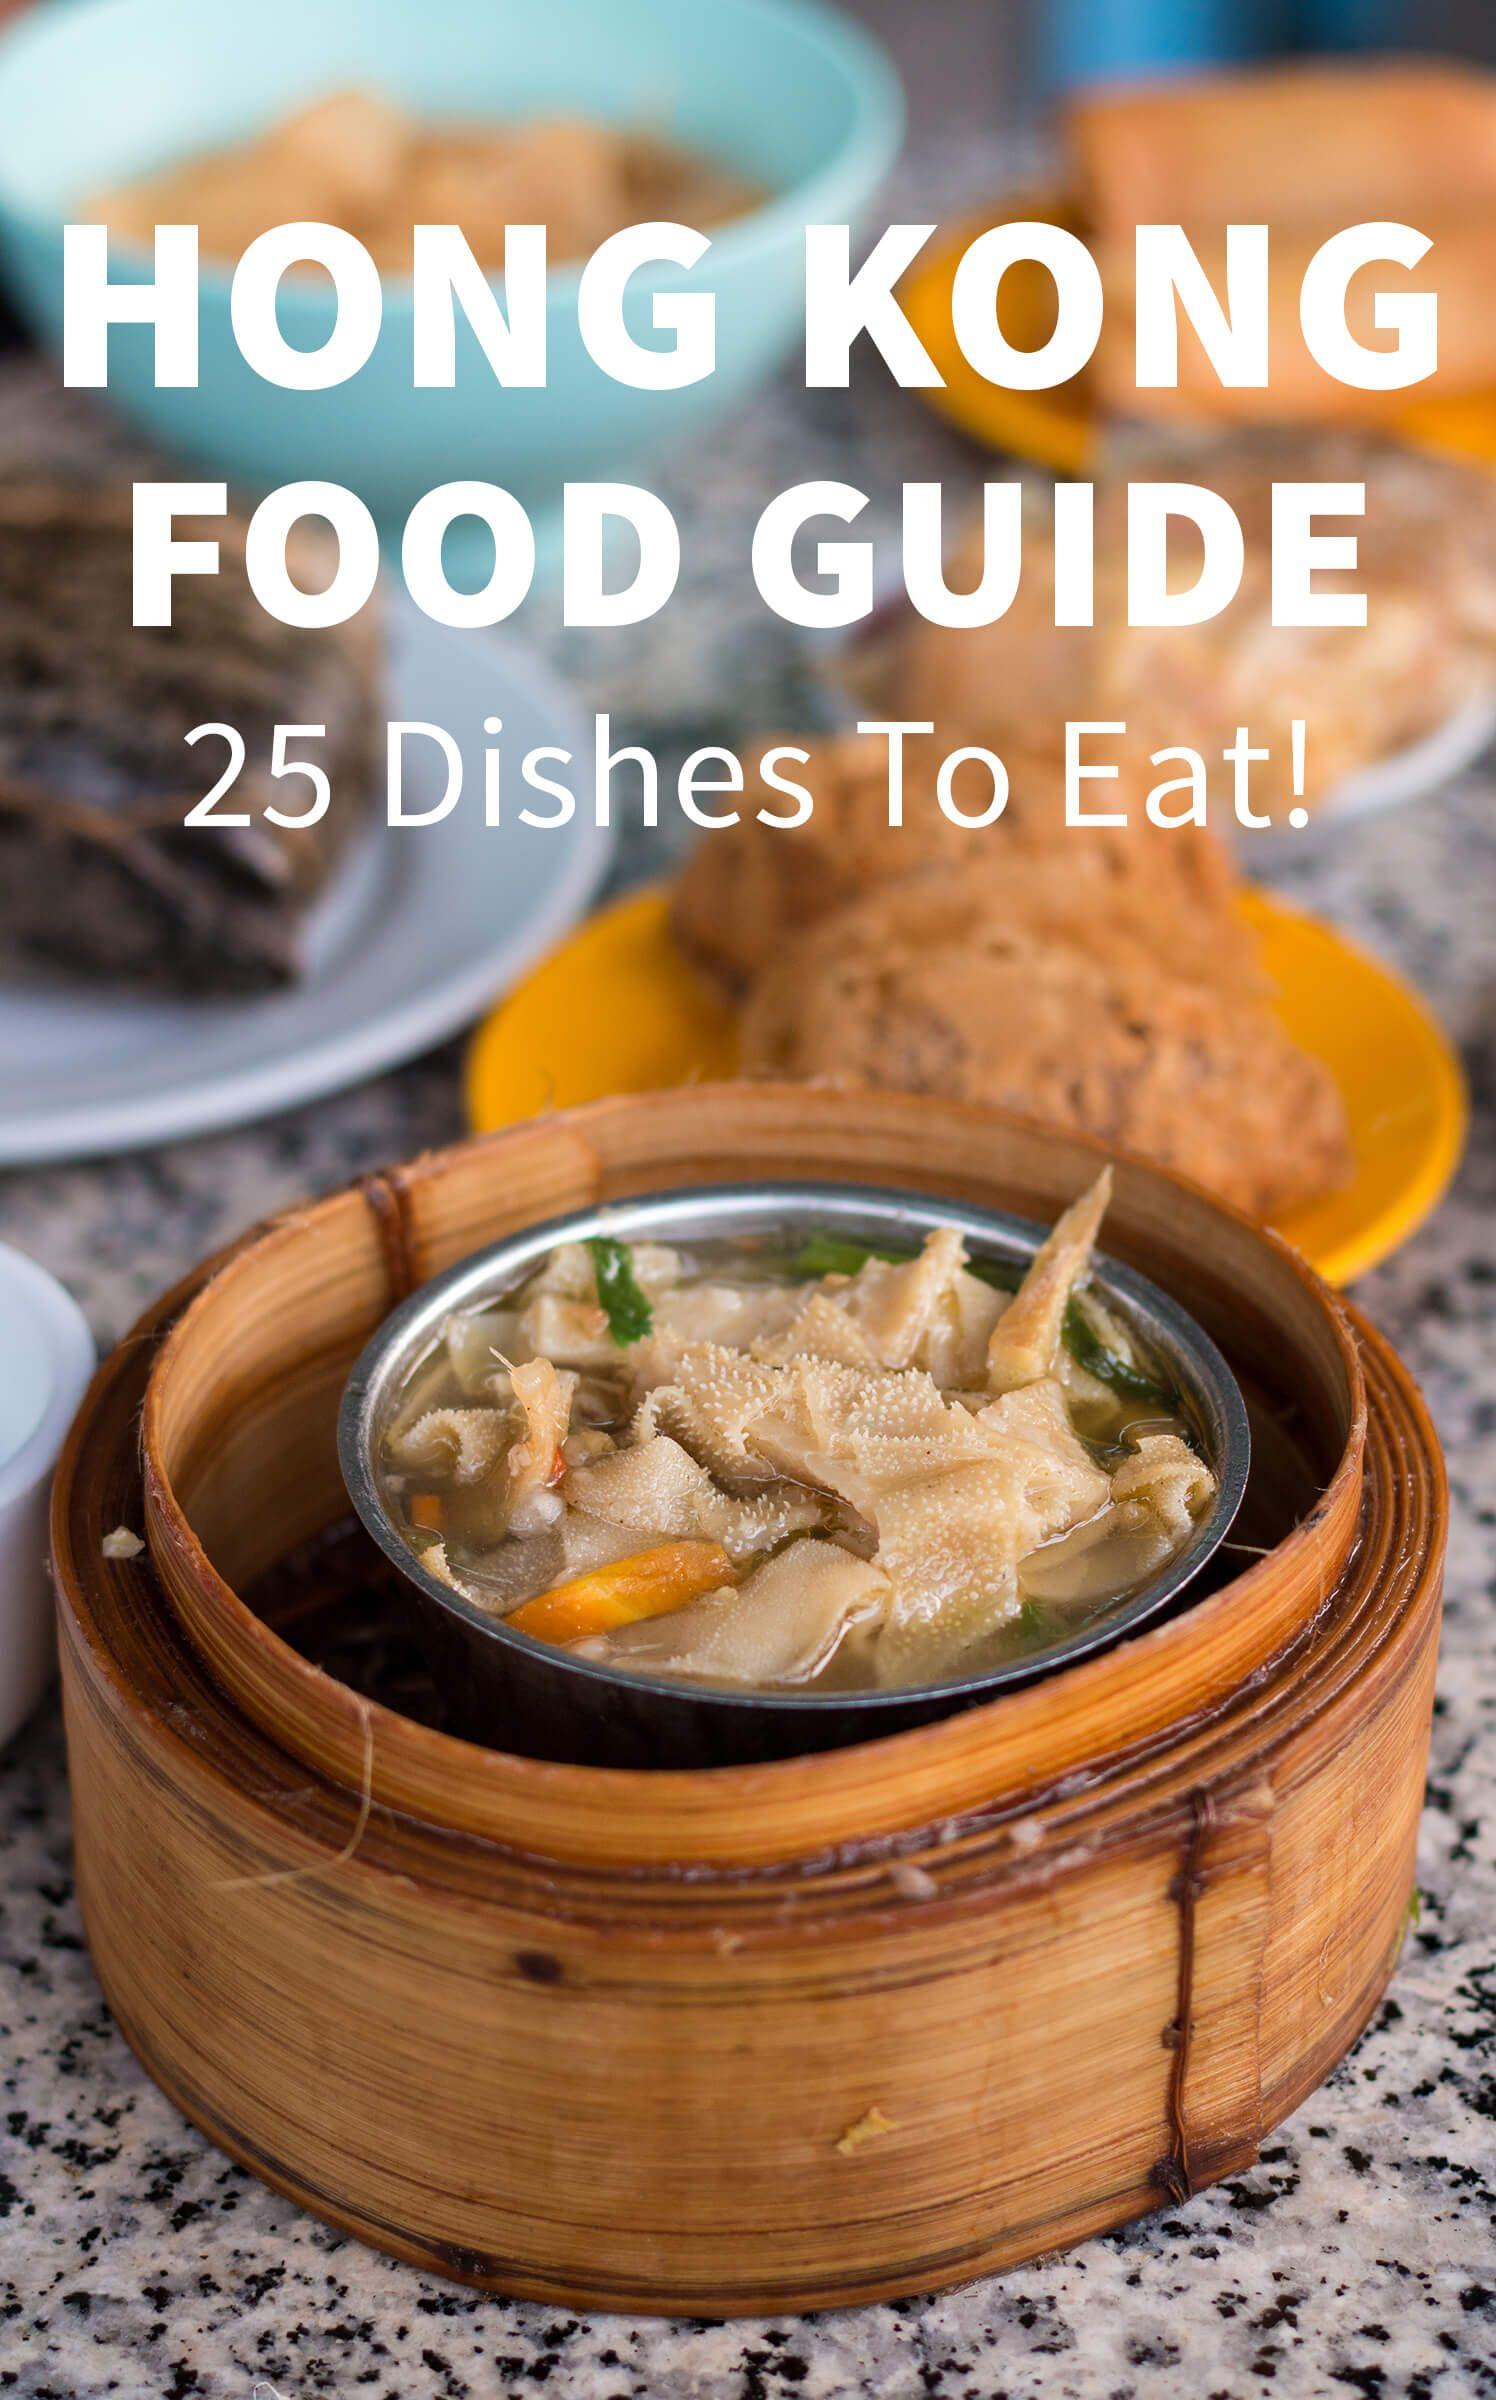 Hong Kong Food Guide 25 Must Eat Dishes Where You Can Try Them Hong Kong Travel Guide Hong Kong Travel Food Guide